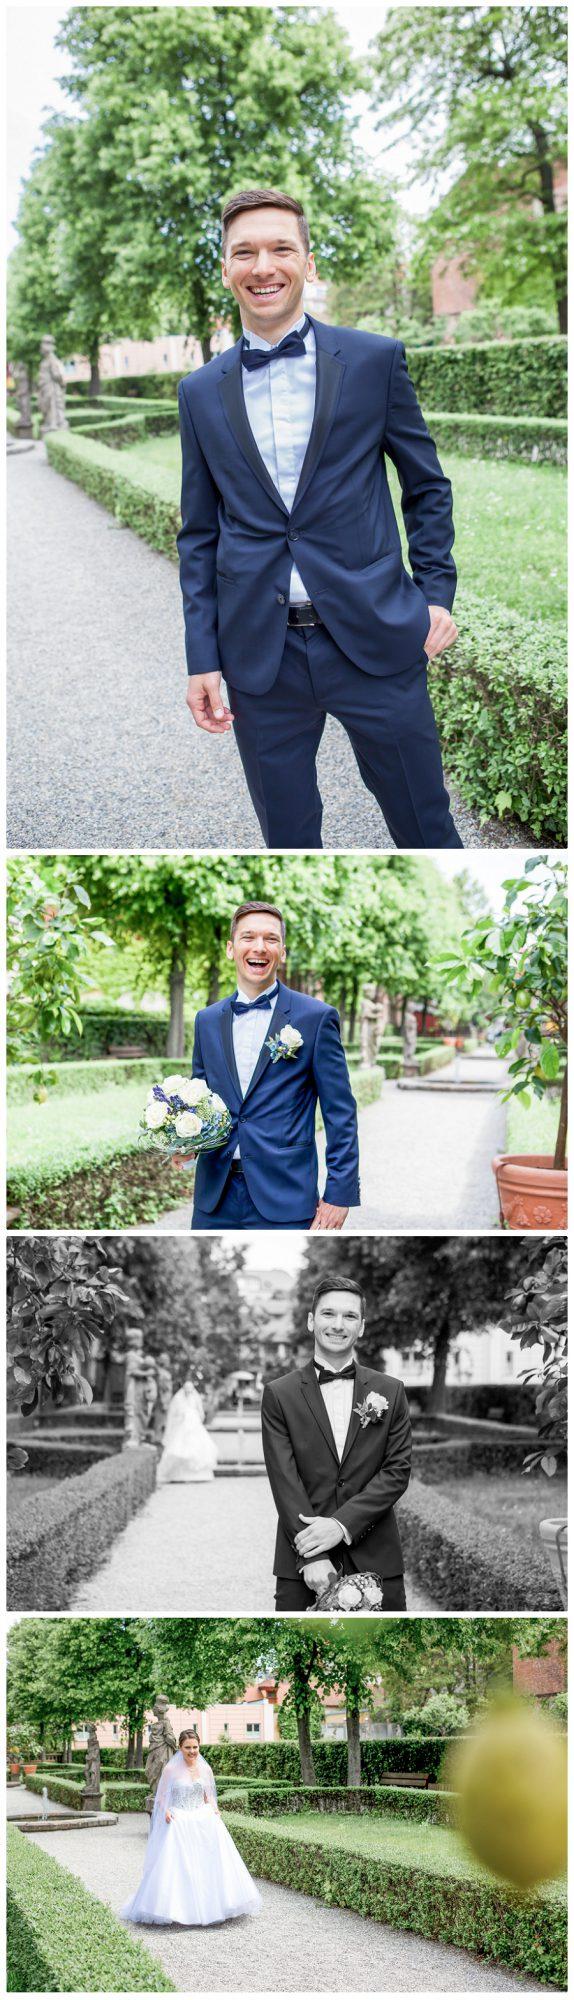 Hochzeit_Strandhaus_Nürnberg_ClaudiaPelny_0006